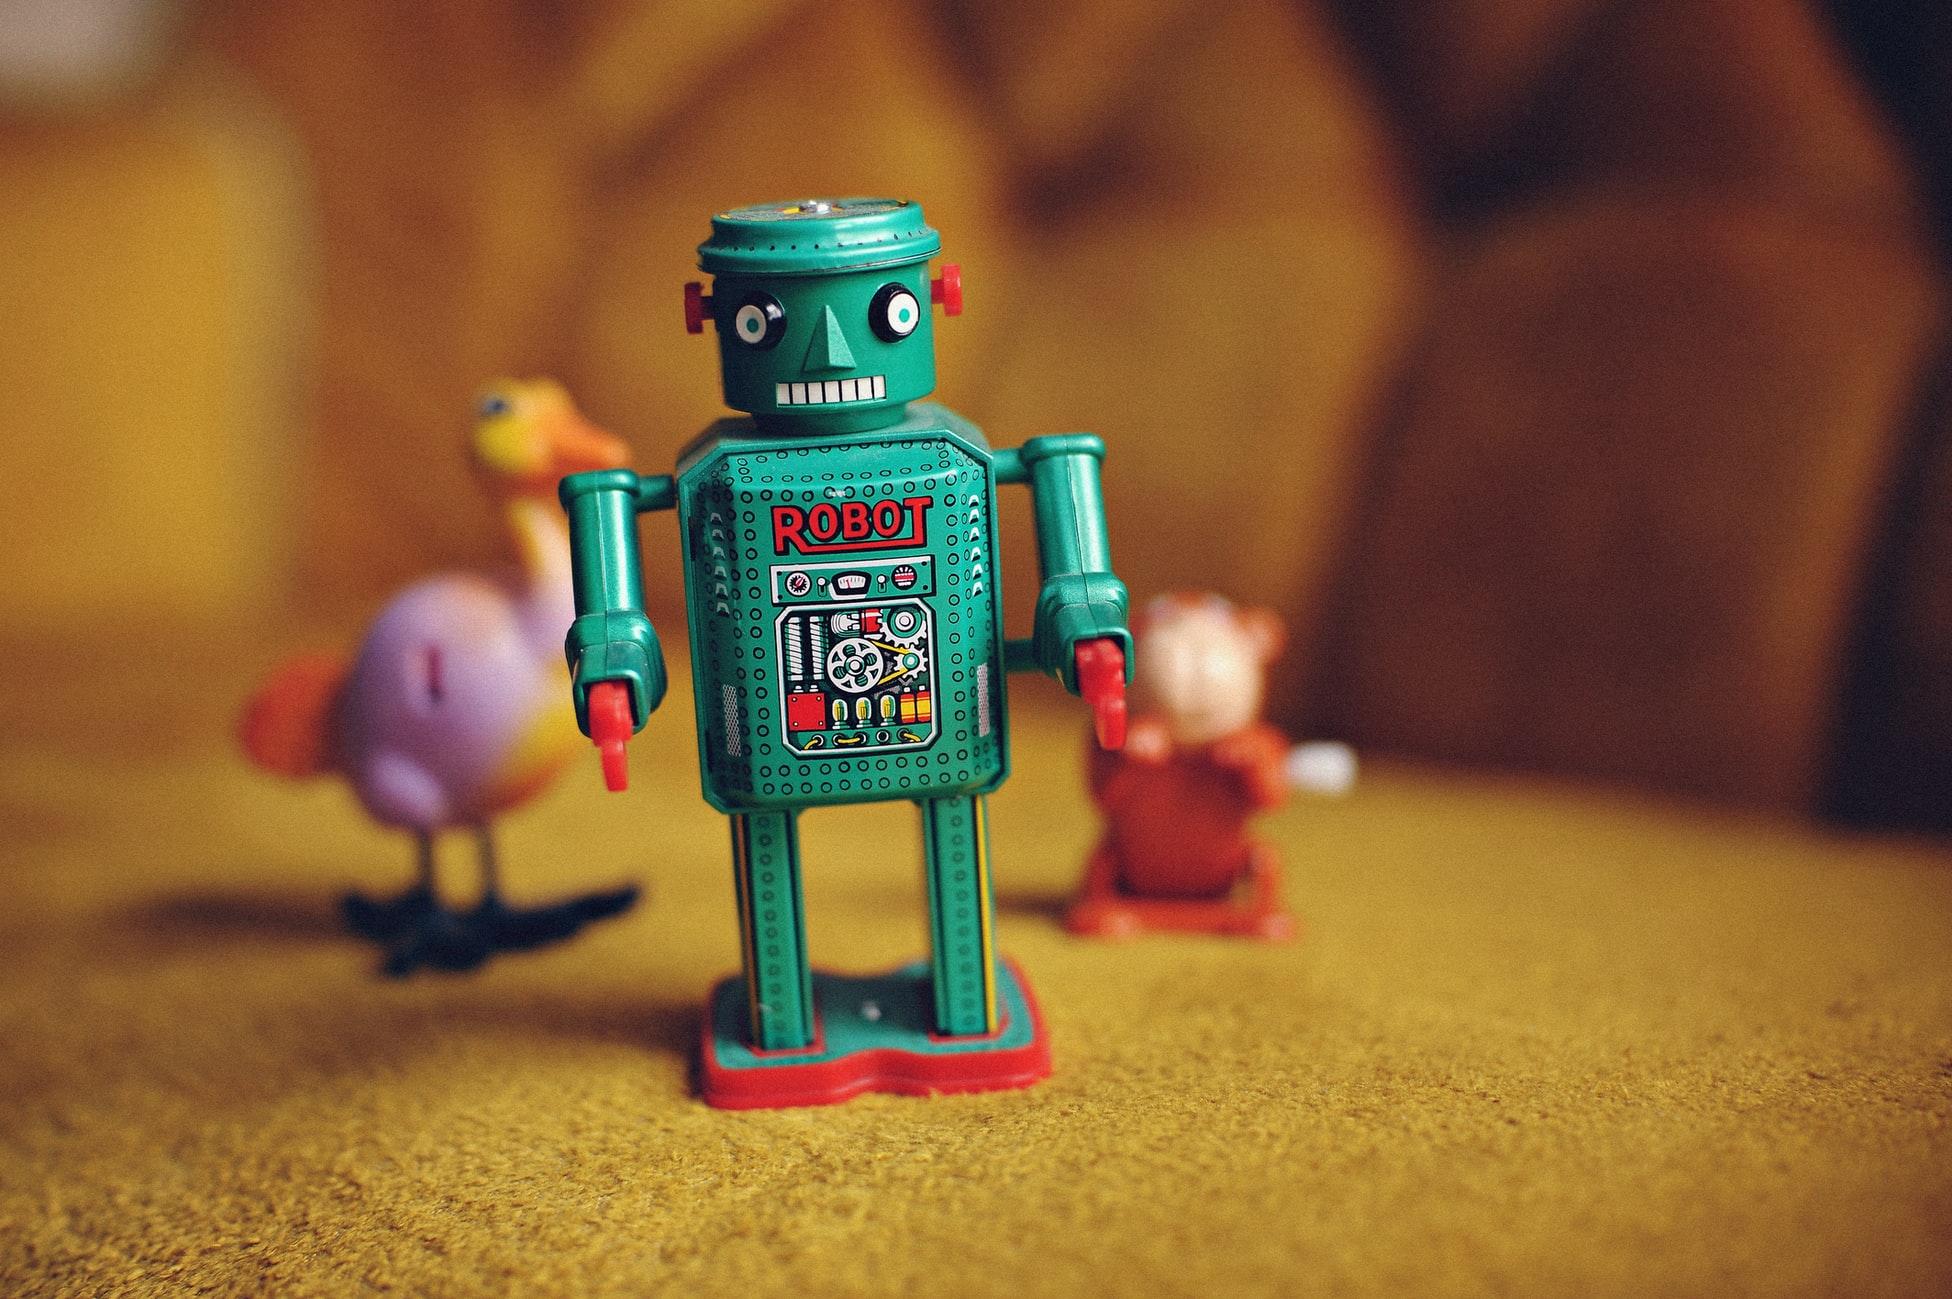 Bender Bending Rodriguez is a 31st-century robot character.